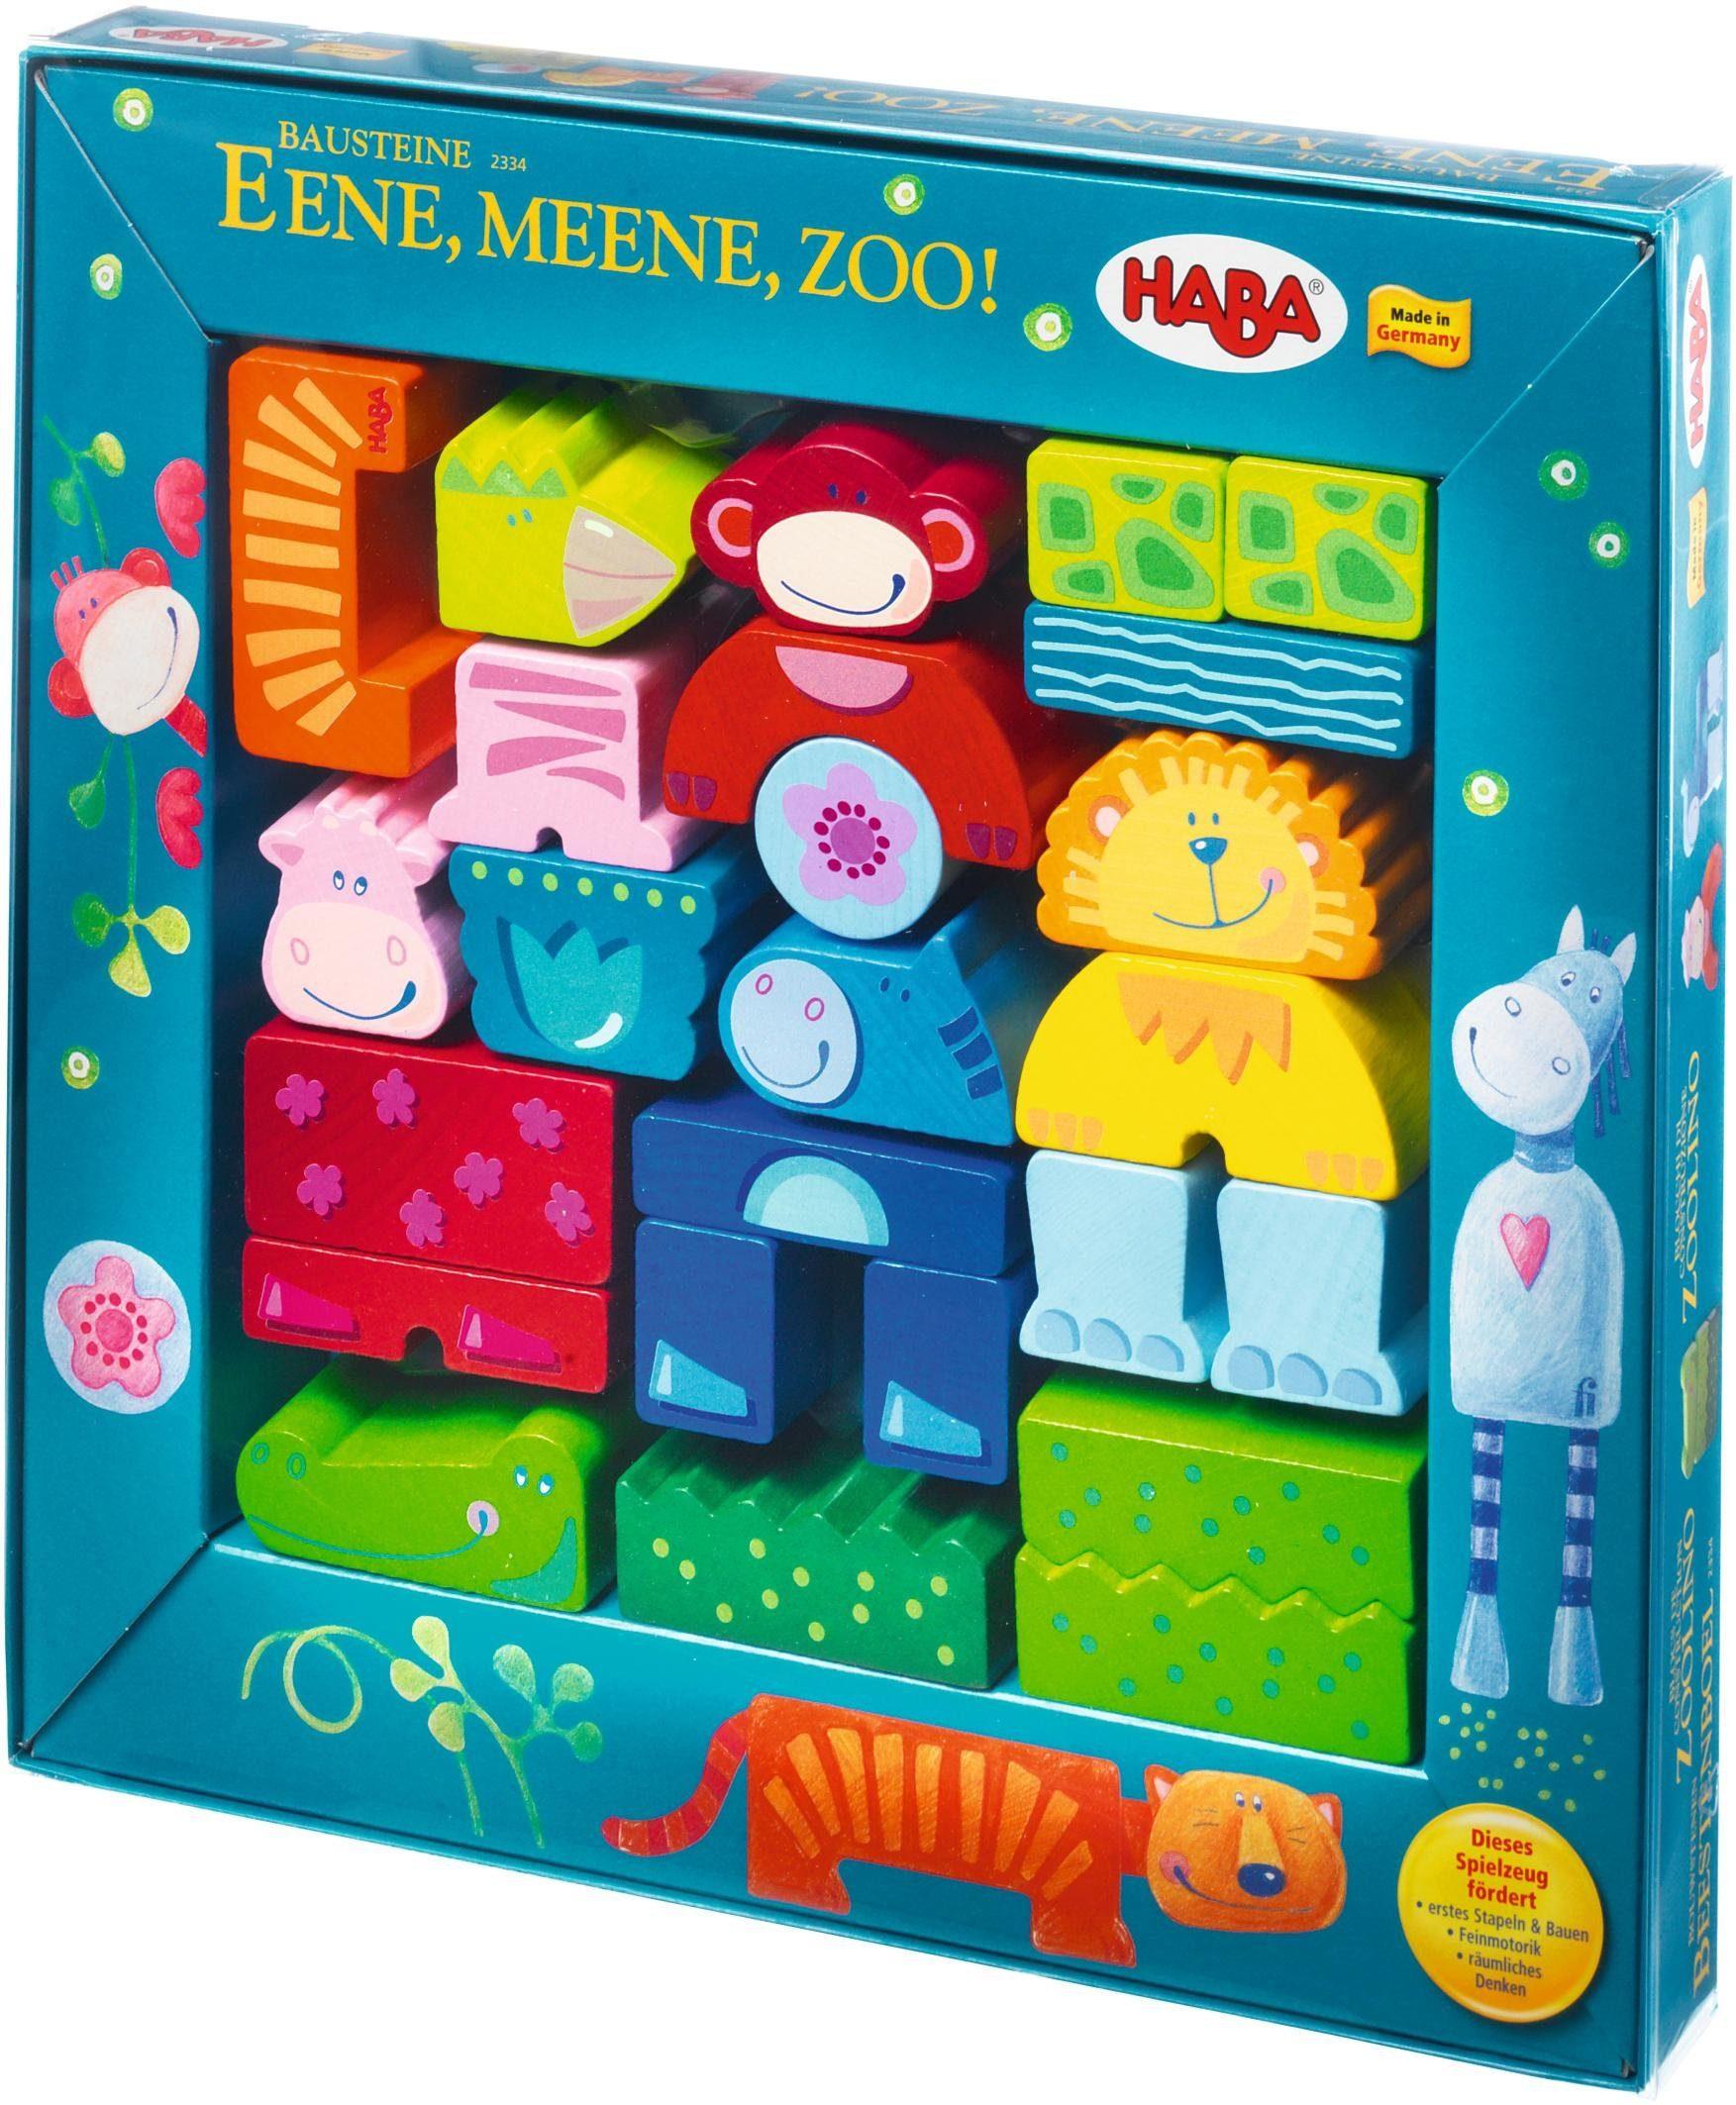 HABA® Bausteine, »Ene, mene, Zoo!«